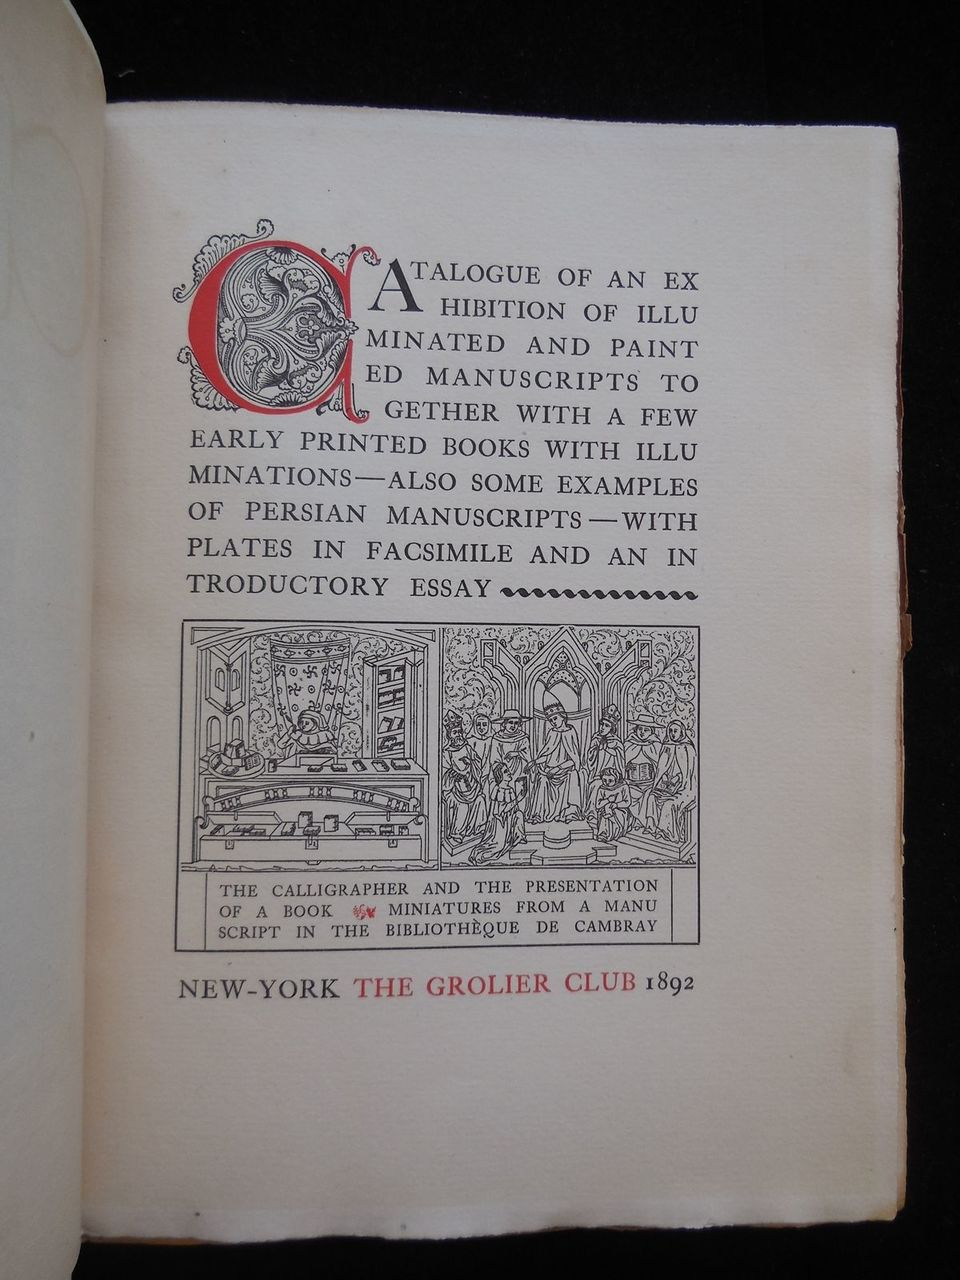 CATALOGUE OF ILLUMINATED AND PAINTED MANUSCRIPTS - 1892 [1st Ed]